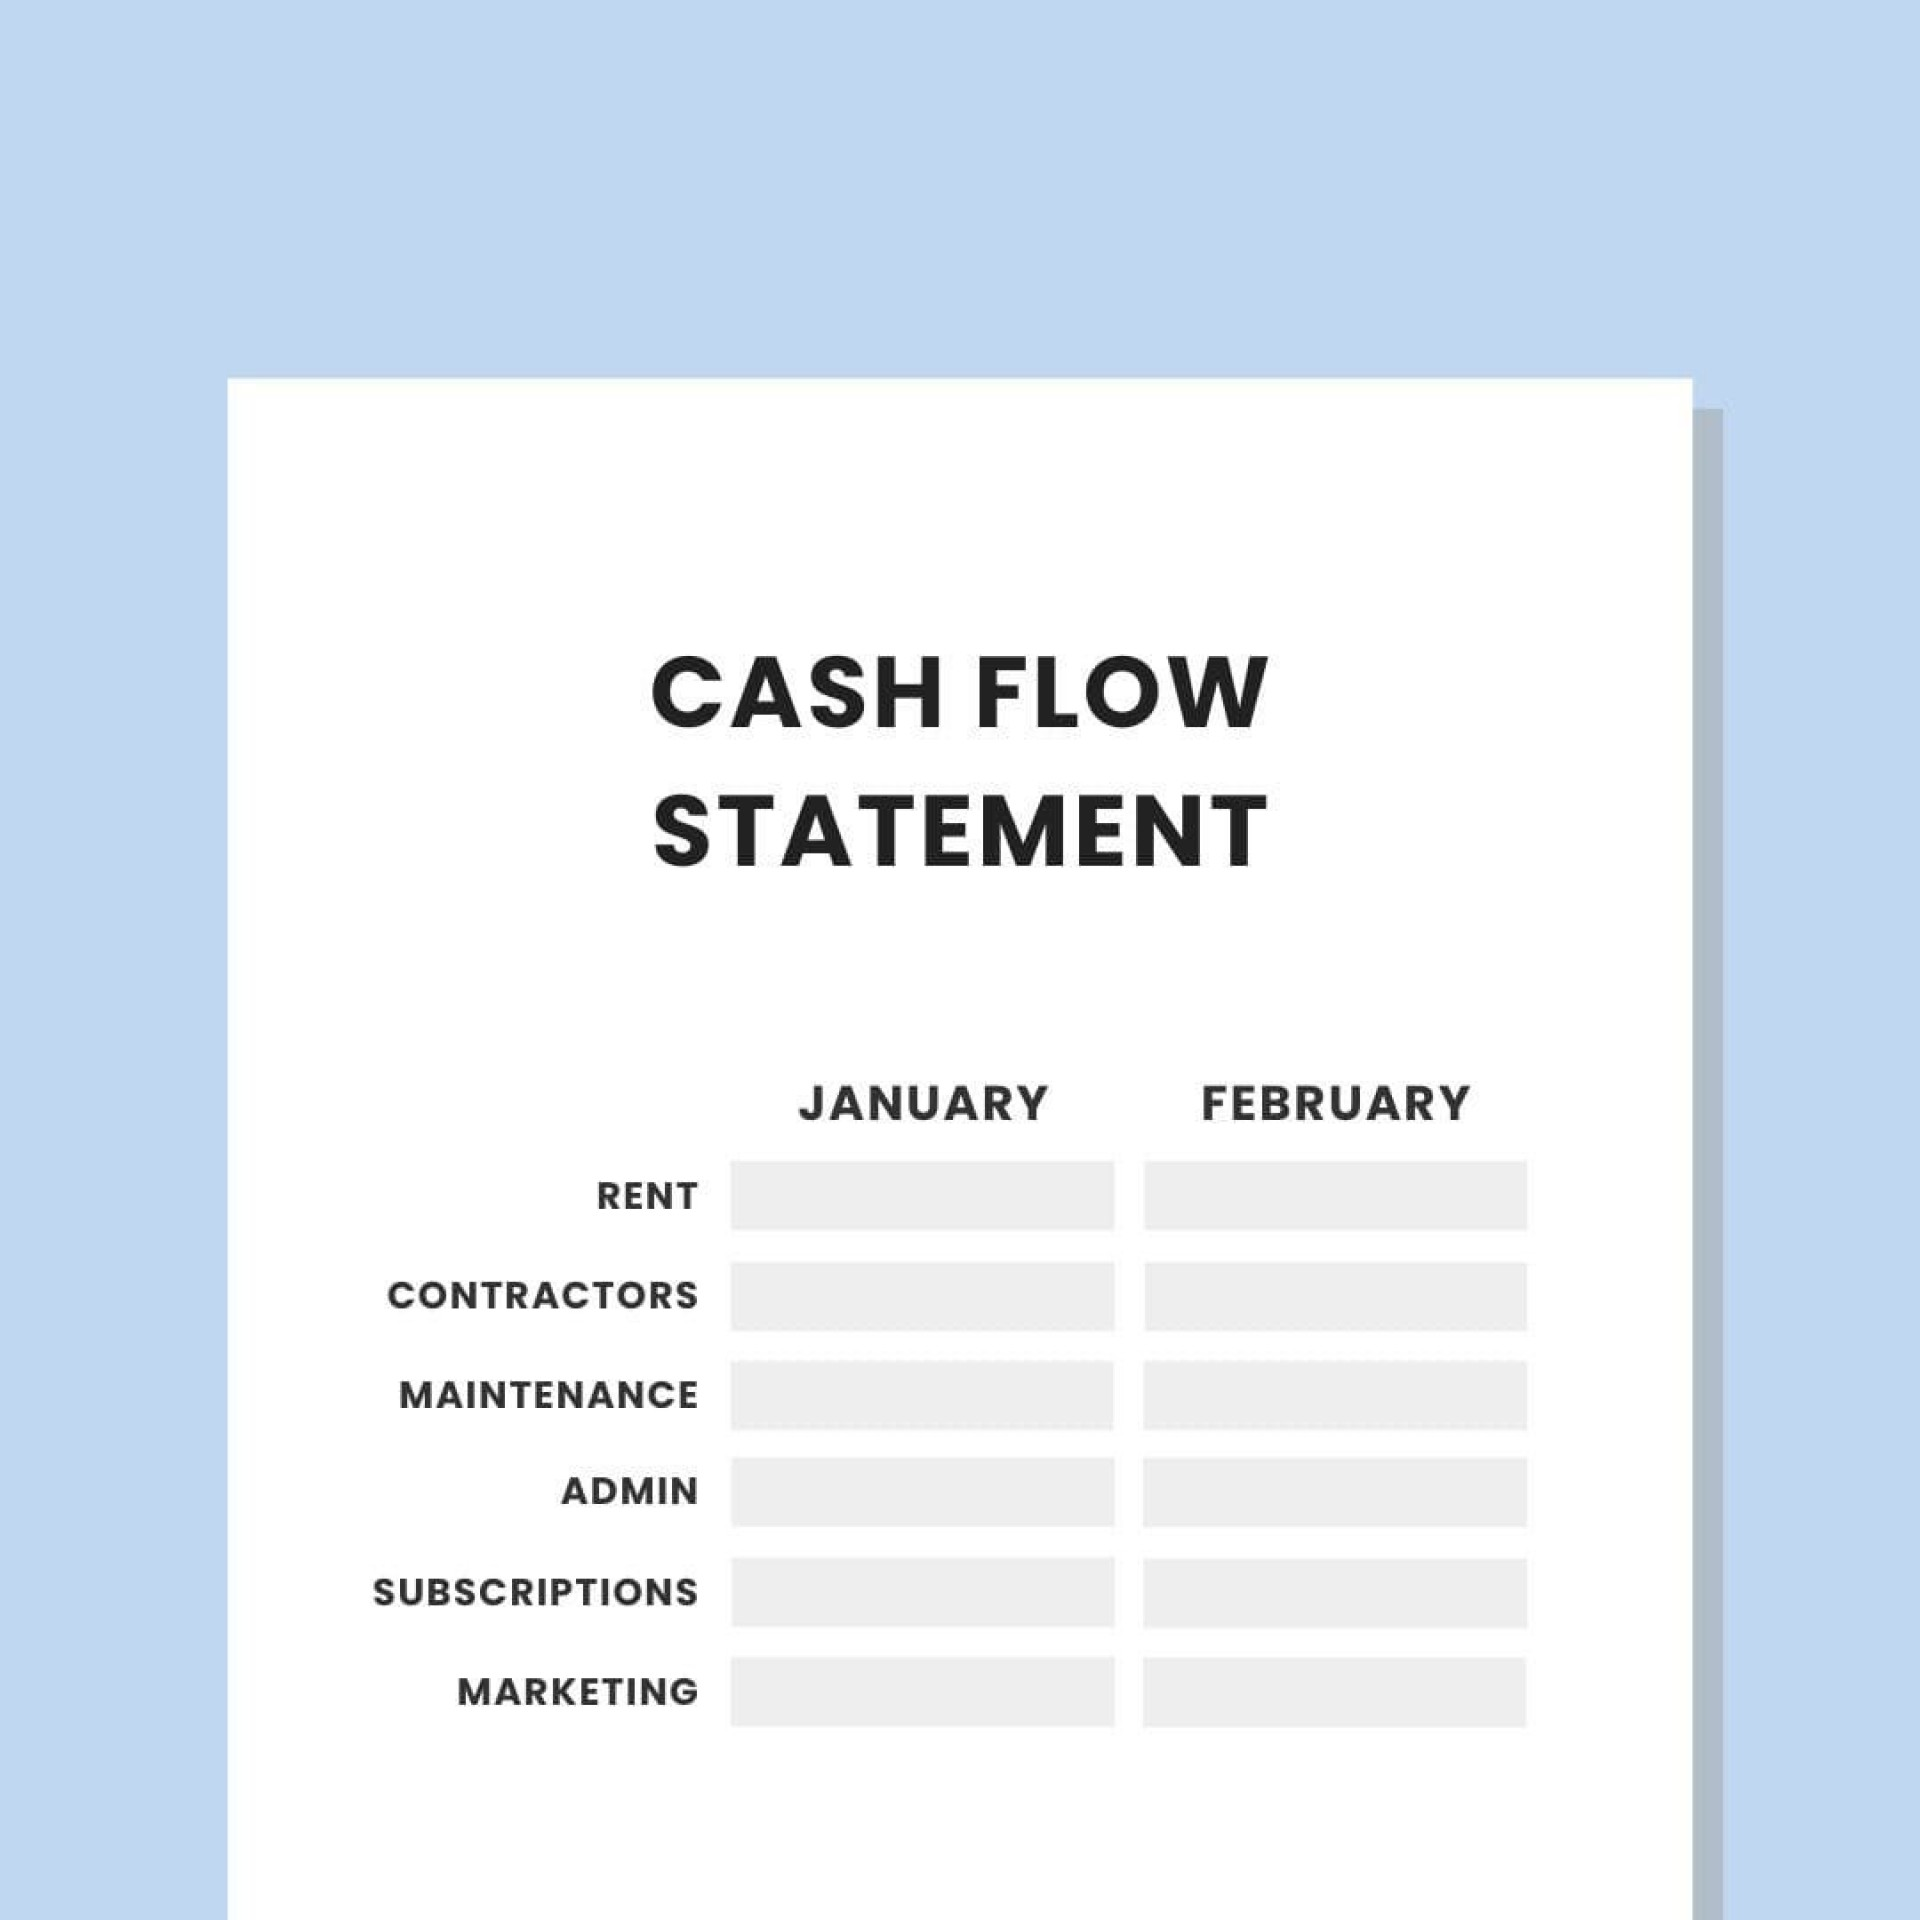 007 Best Statement Of Cash Flow Template Australia High Def 1920